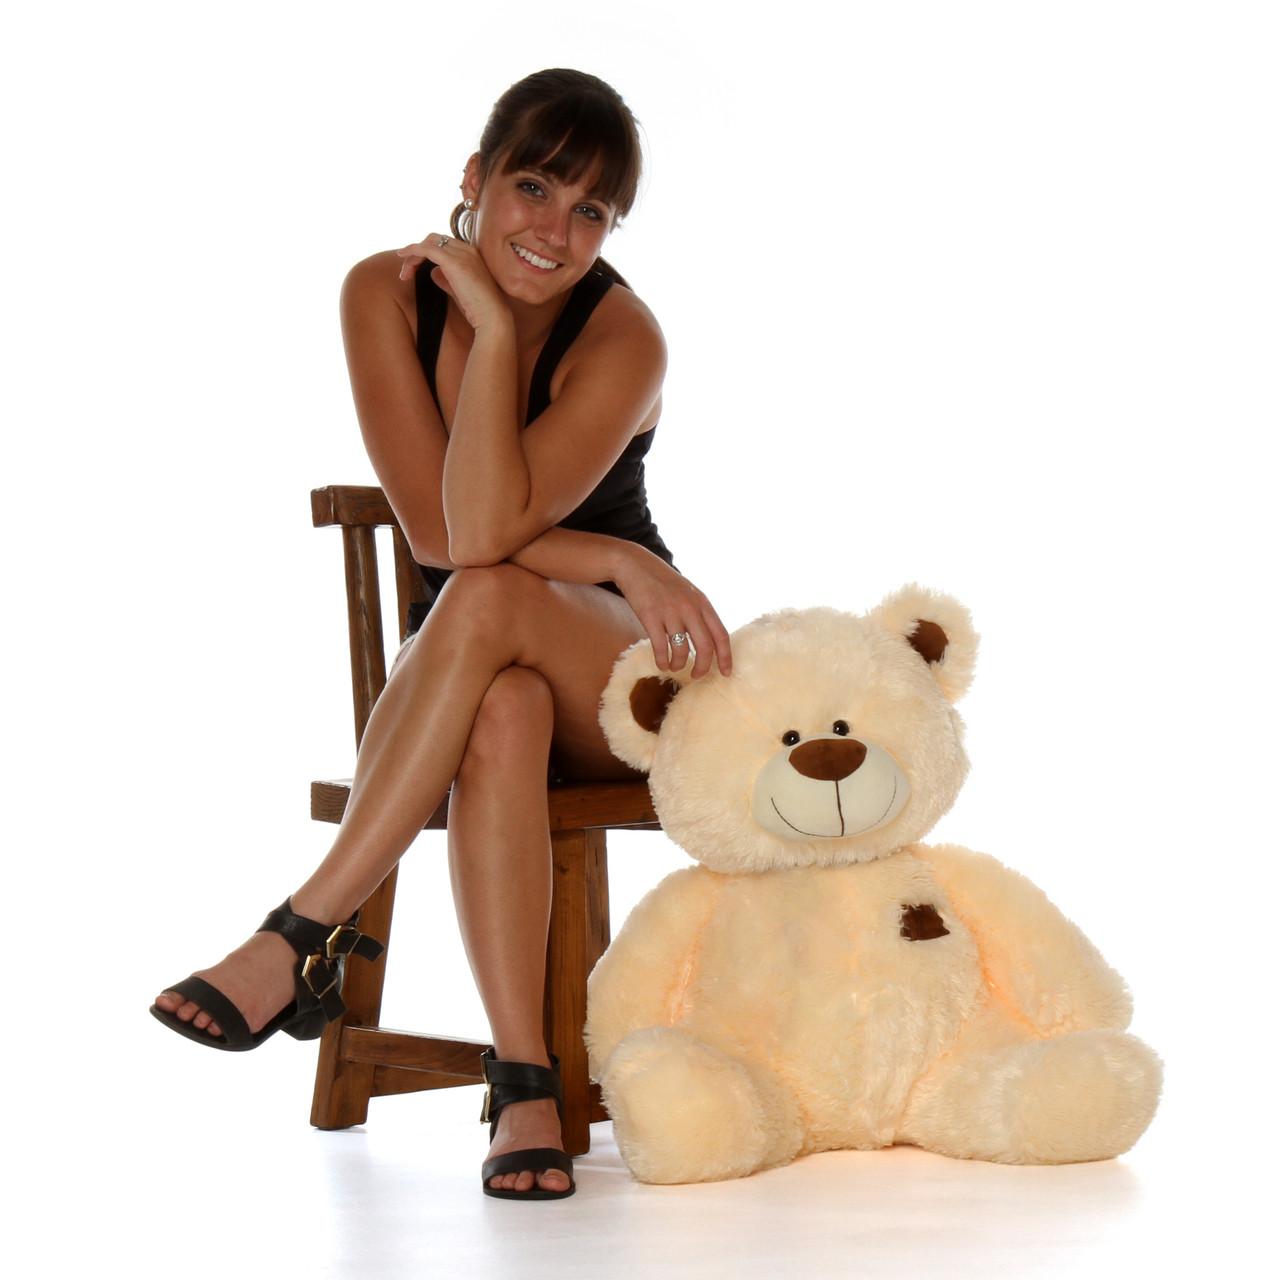 2.5 Foot Sitting Position Big Teddy Bear Skin color Tan Cream Bear